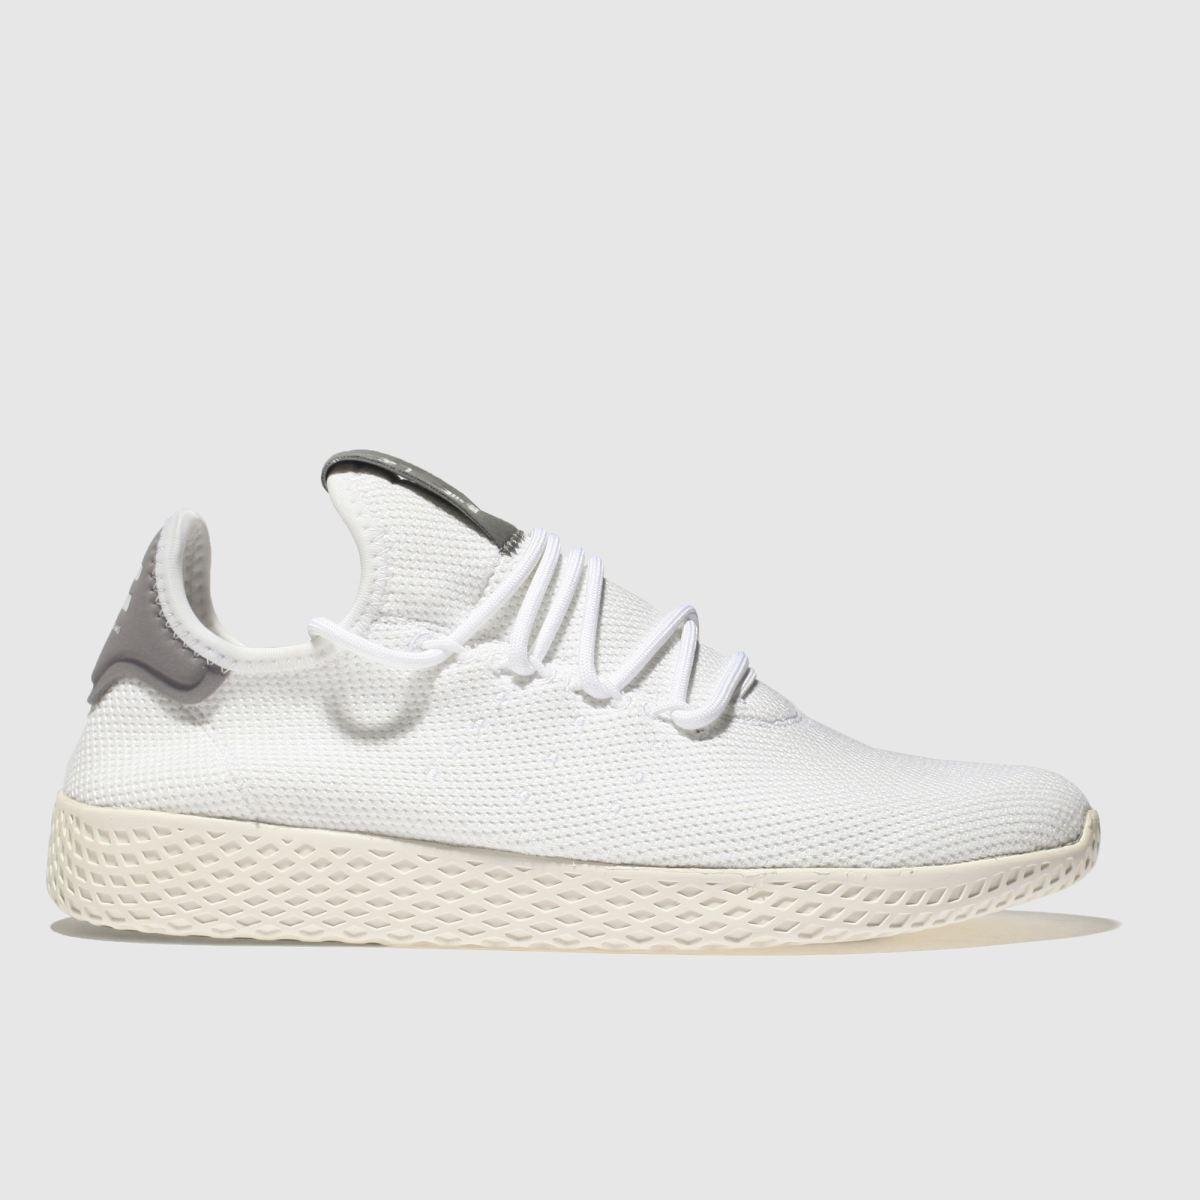 Adidas White & Grey Pharrell Williams Tennis Hu Trainers